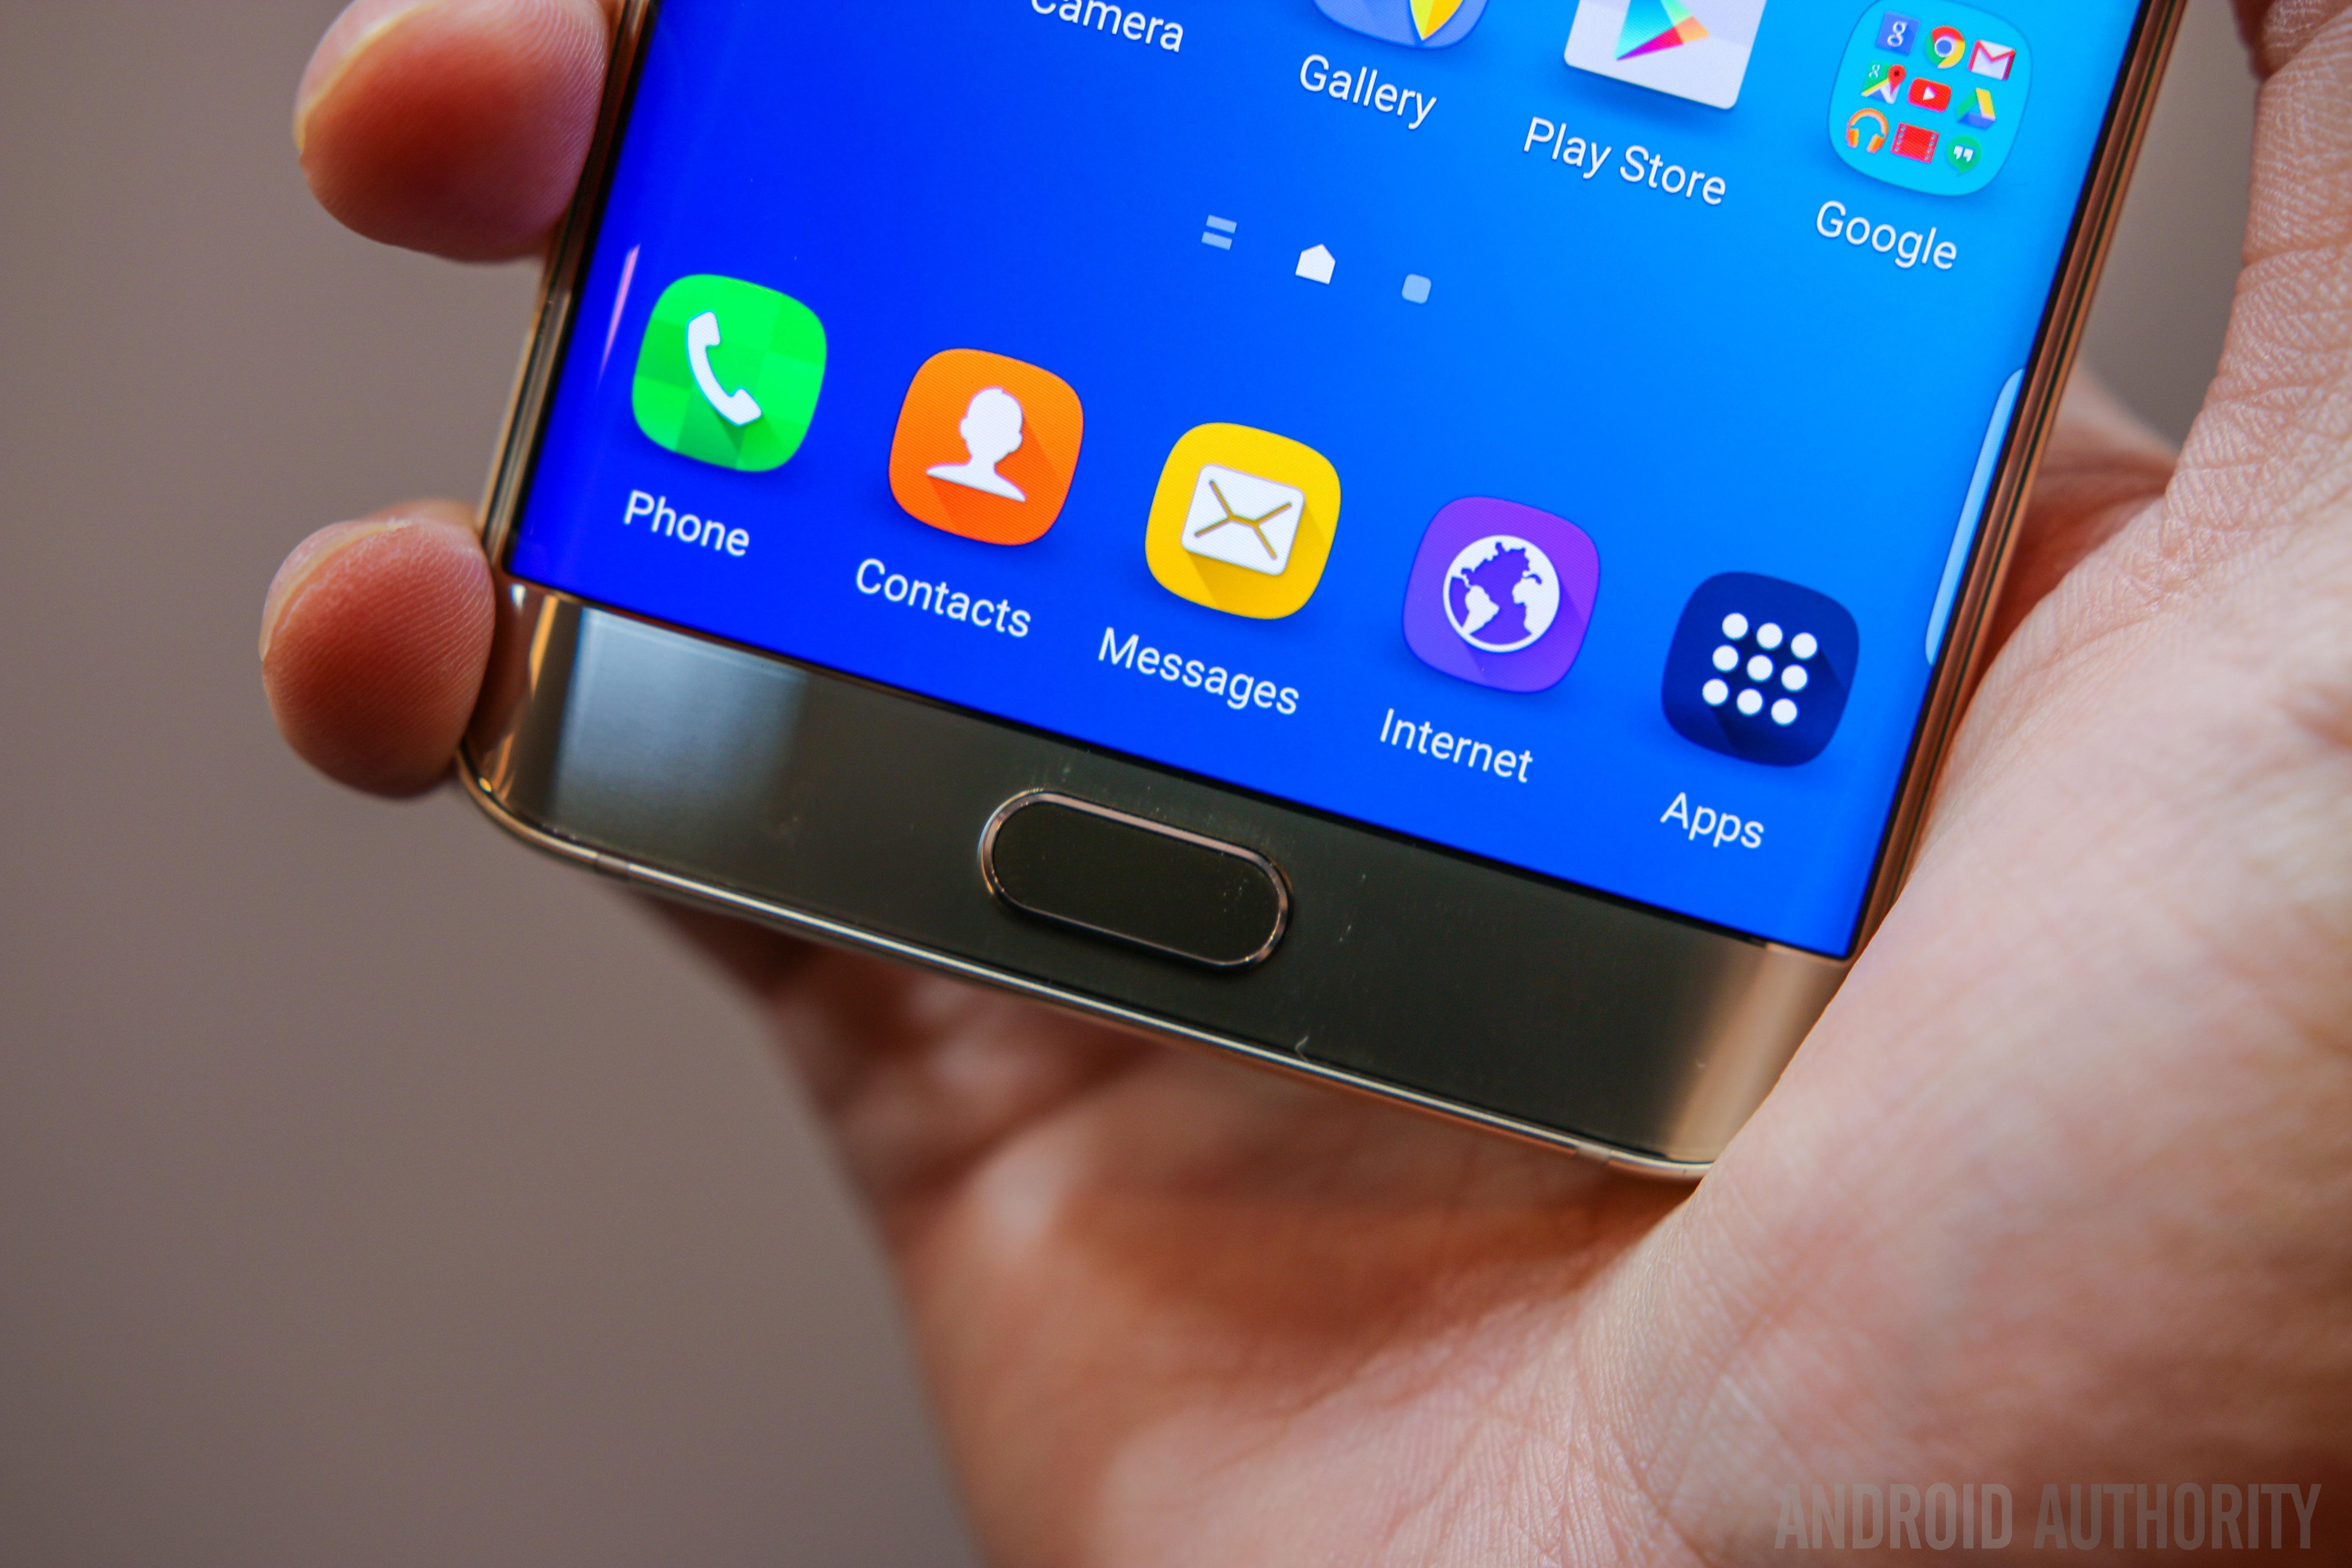 Samsung Galaxy S6 Edge Plus Hands On-12